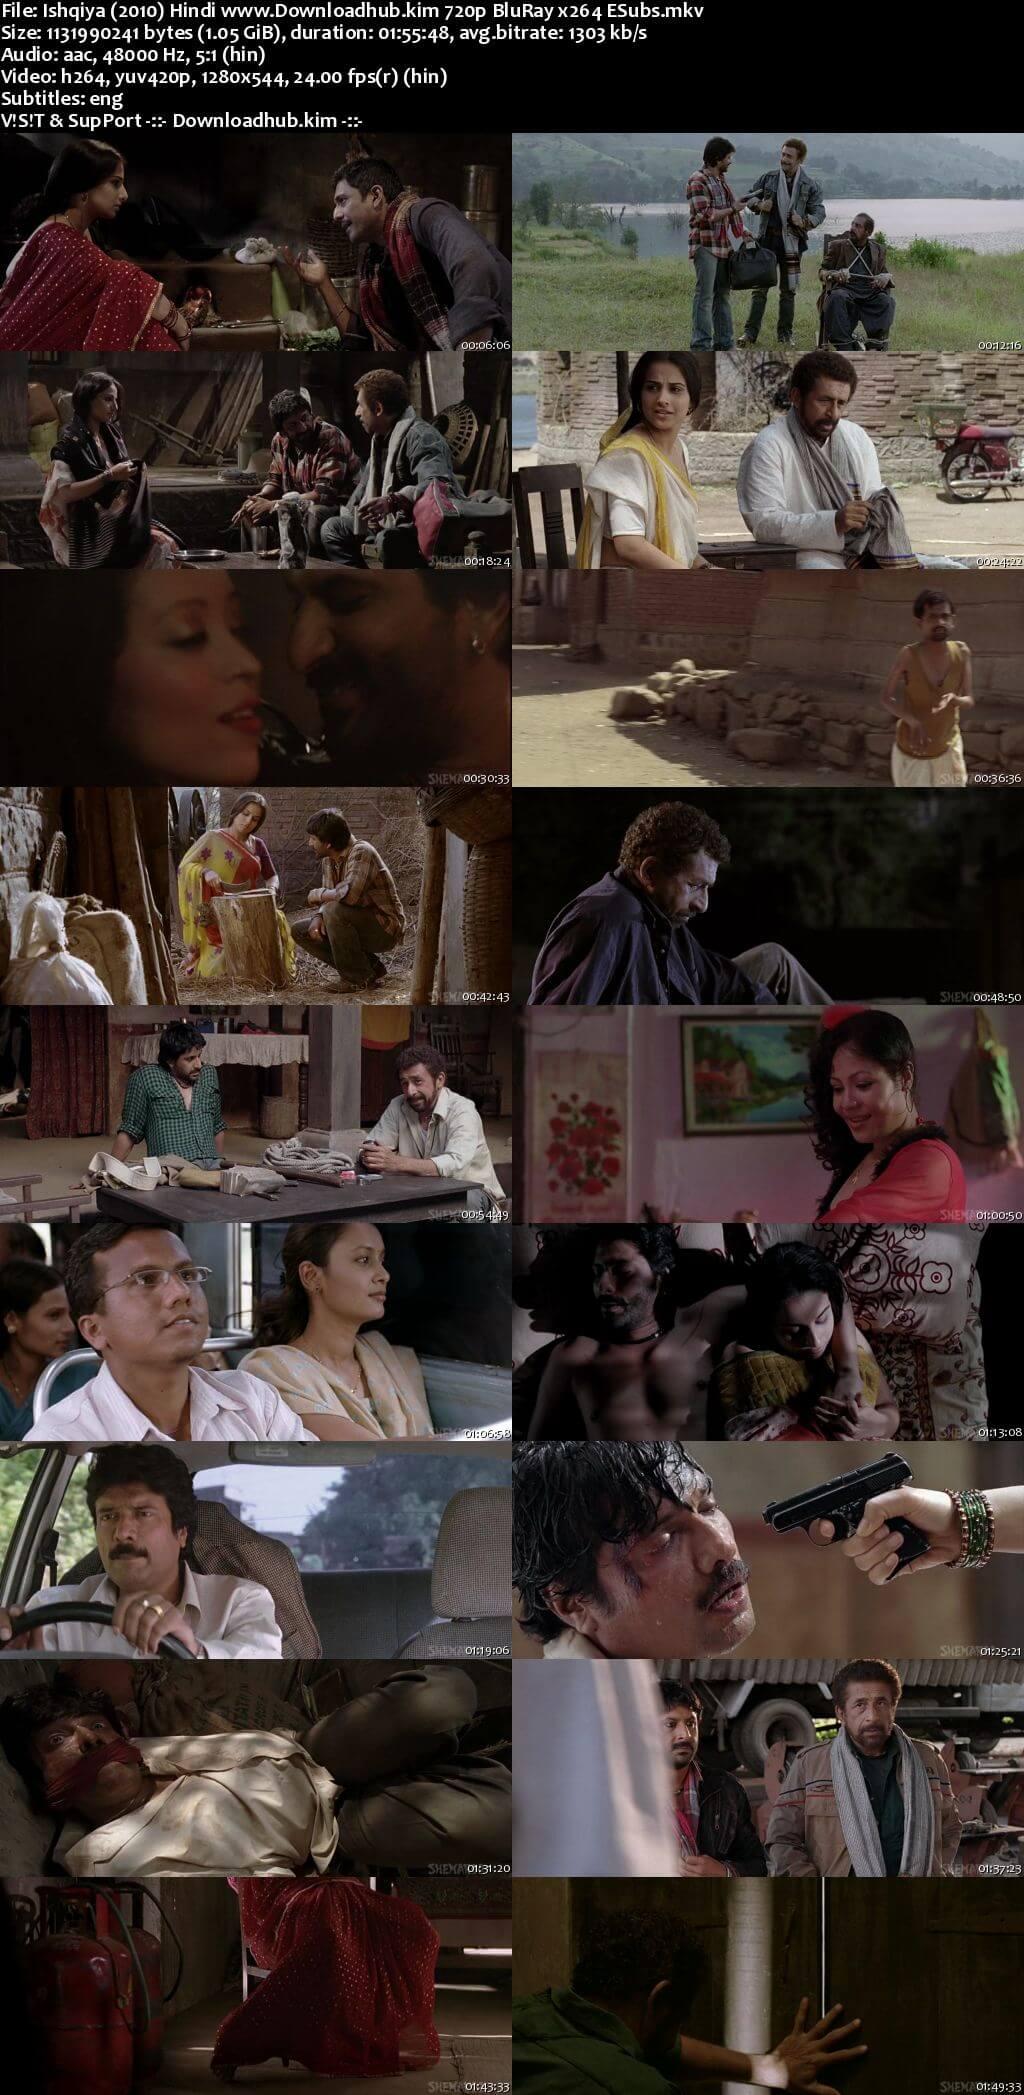 Ishqiya 2010 Hindi 720p BluRay ESubs